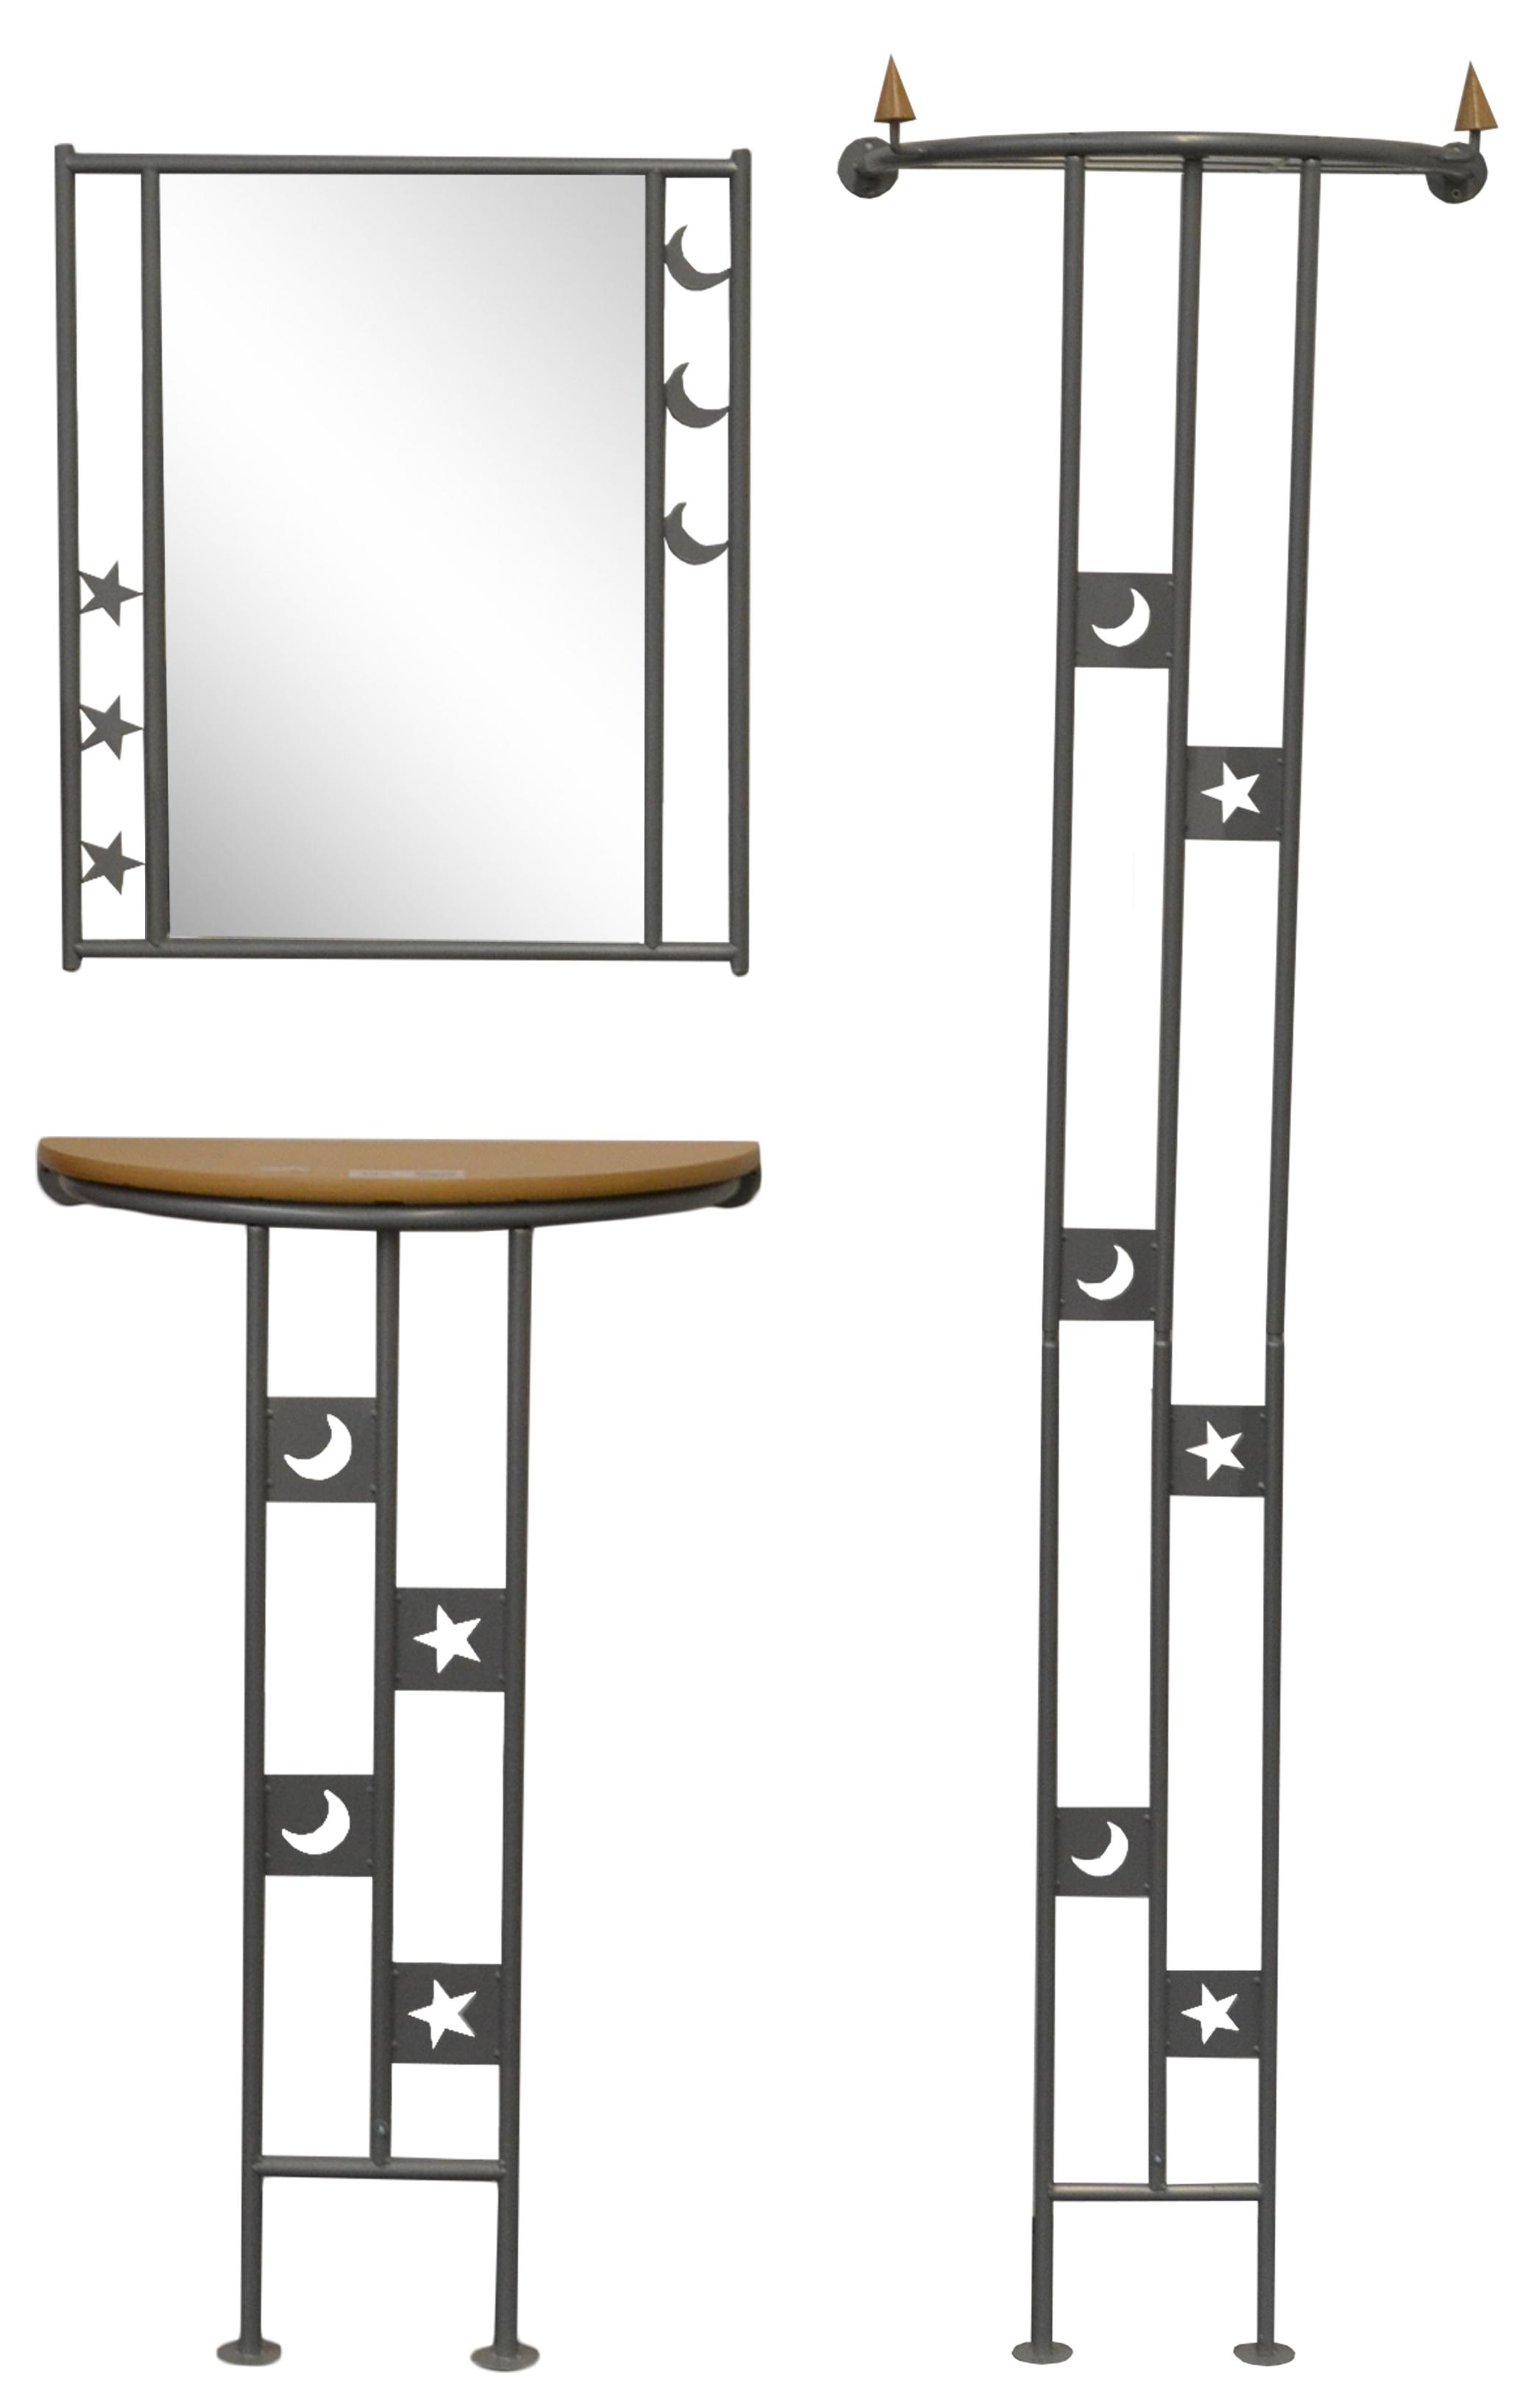 spiegel 3 teilig bilder das sieht elegantes mobelpix. Black Bedroom Furniture Sets. Home Design Ideas